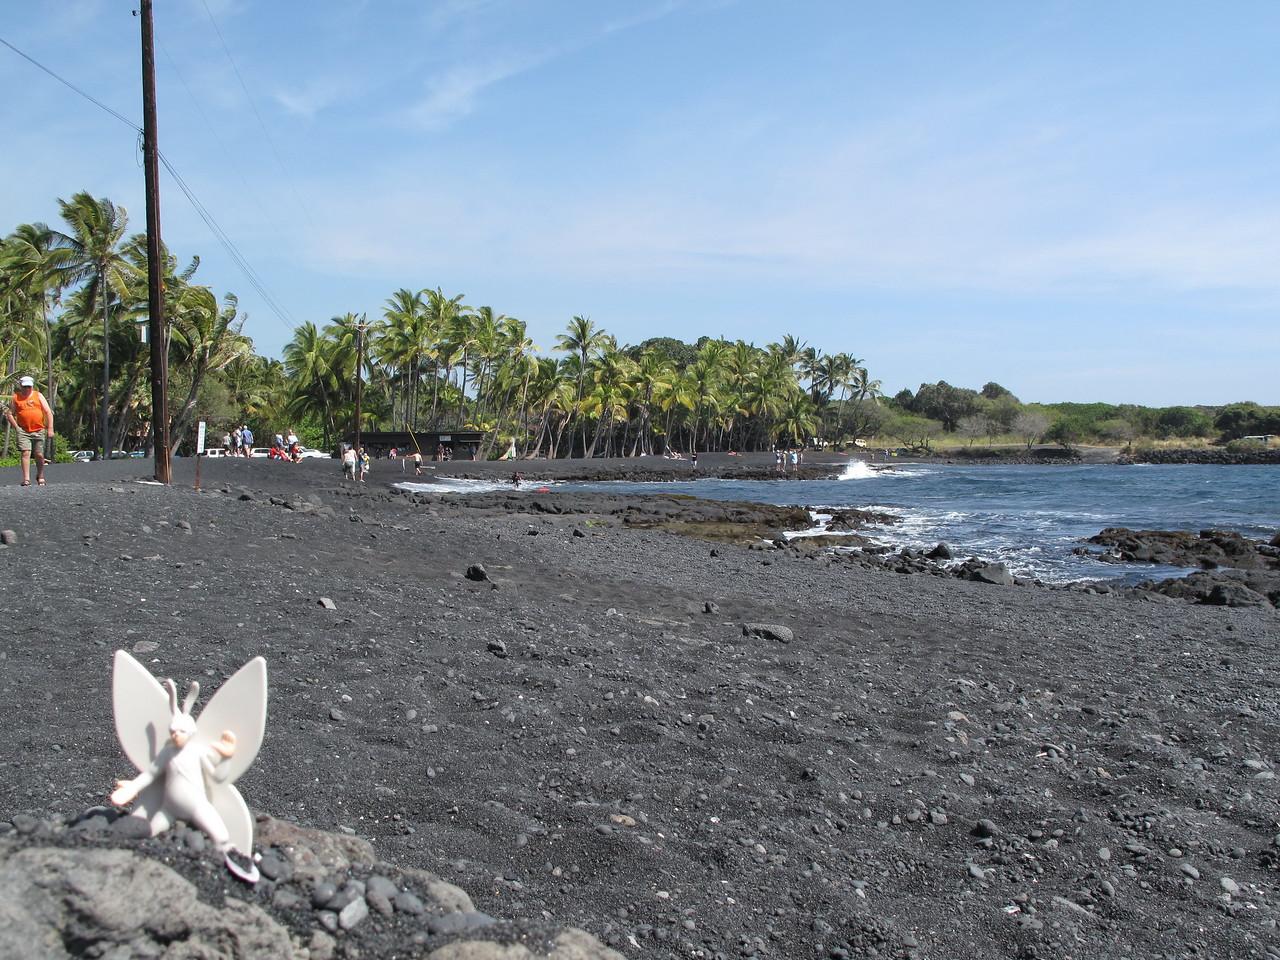 2011-10-29 Punalu'u Black Sand Beach, Hawaii